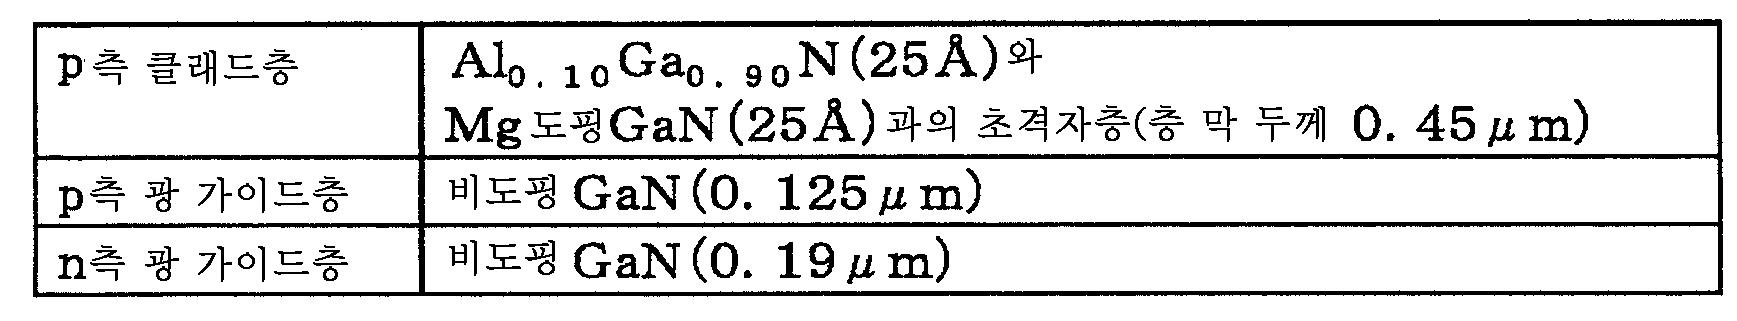 Figure 112005017464102-pat00002